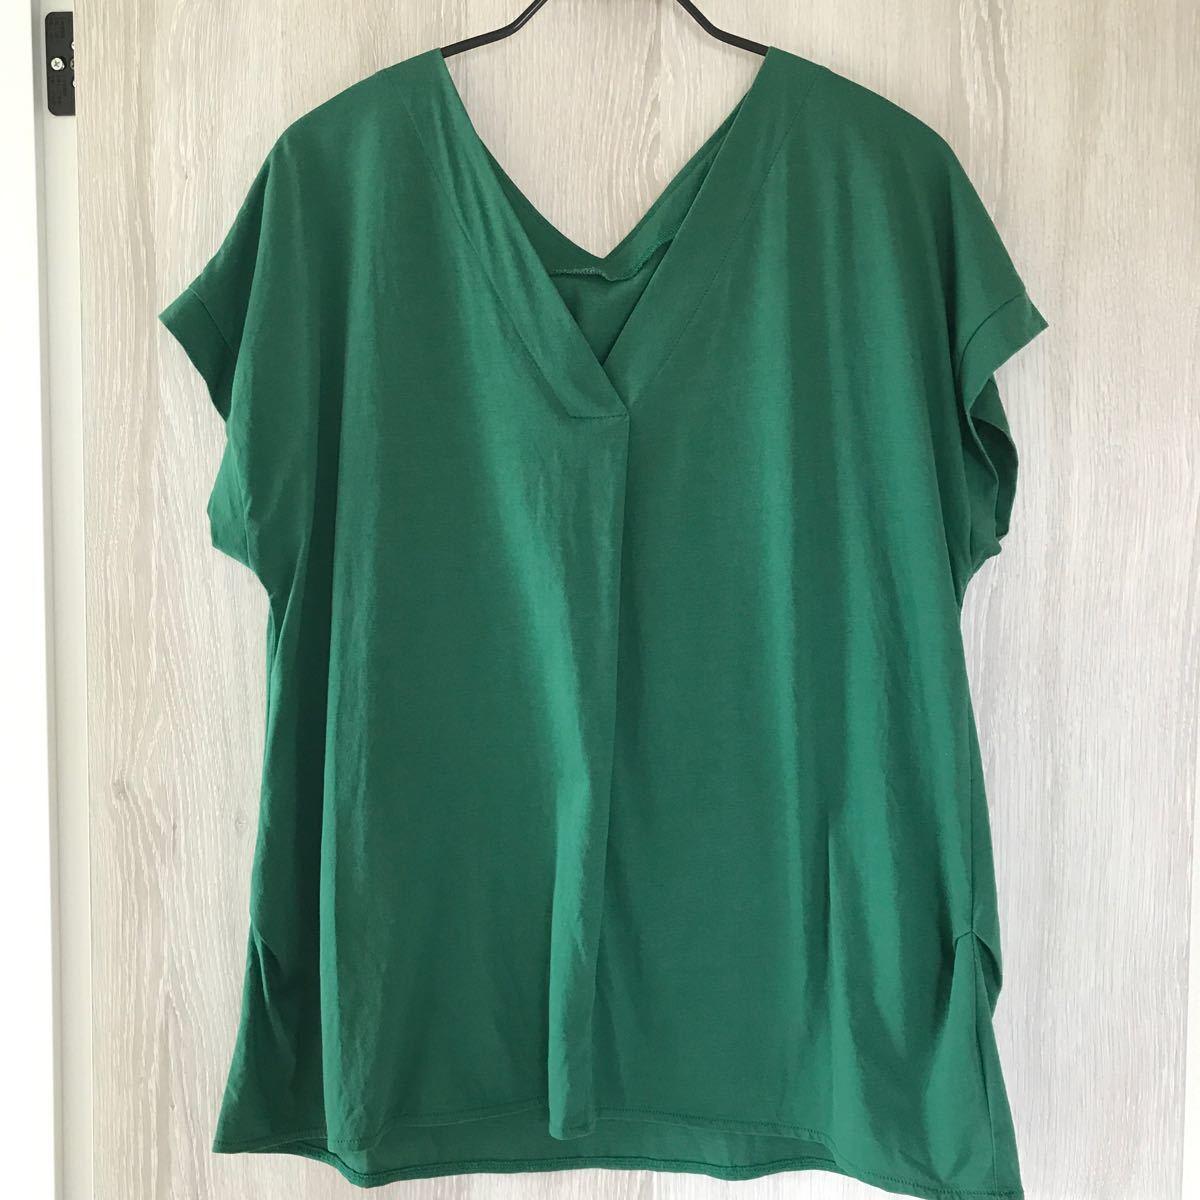 【PLST】 グリーントップス Tシャツ